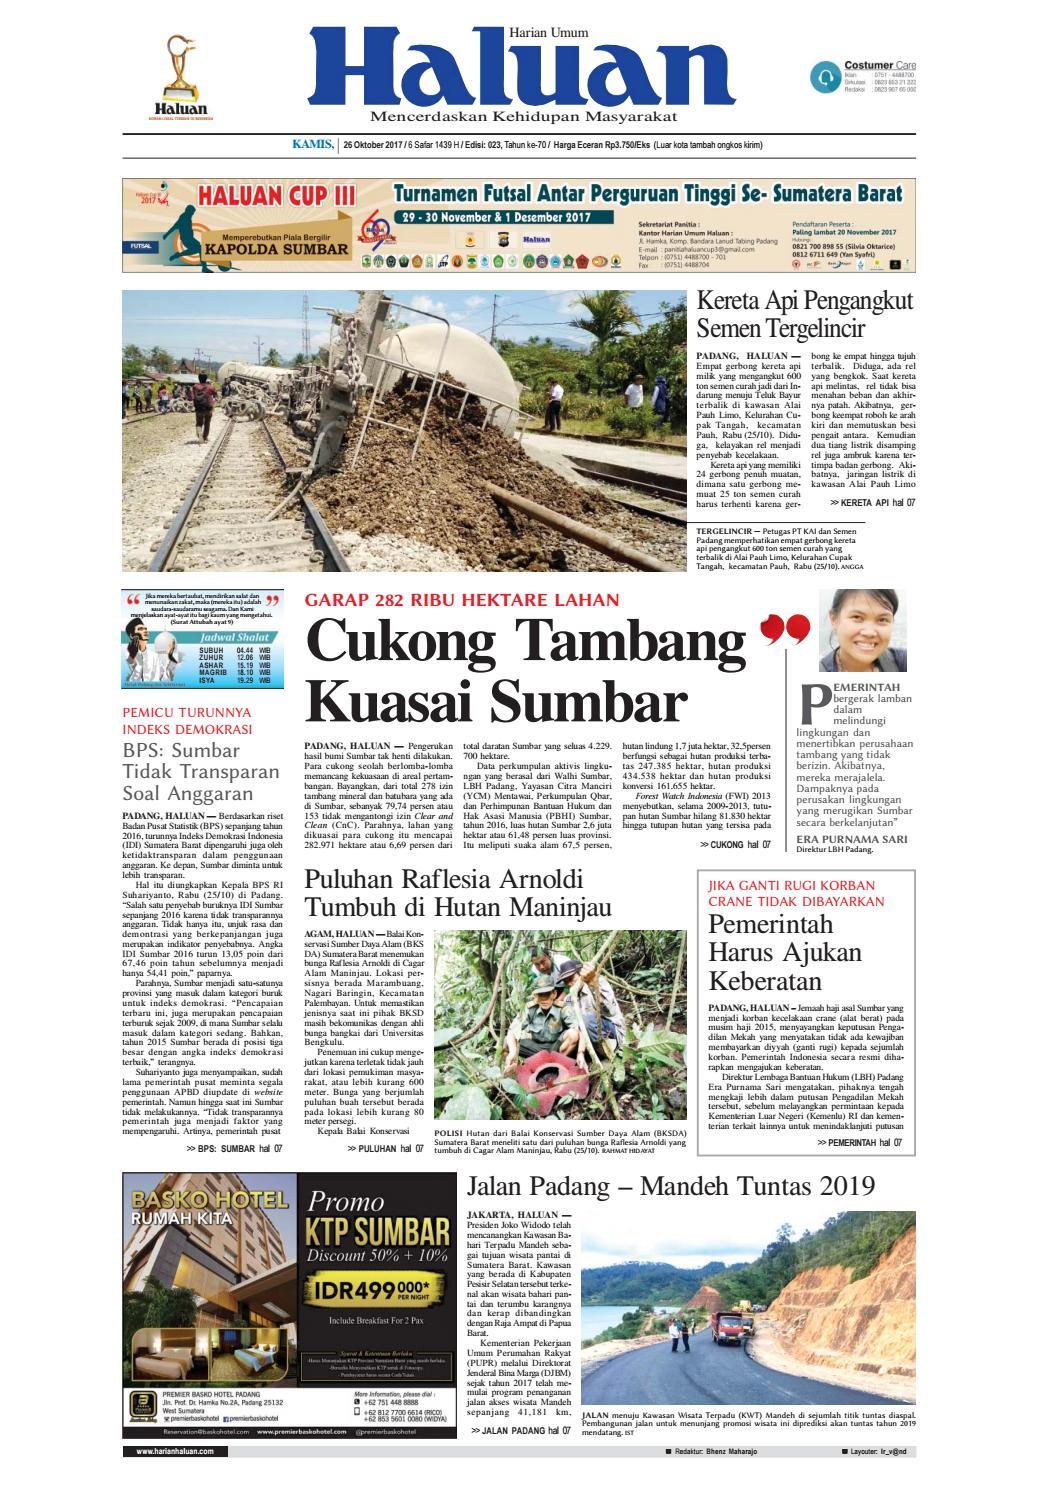 Haluan 26 Oktober 2017 By Harian Issuu Produk Ukm Bumn Sulam Usus Pmk